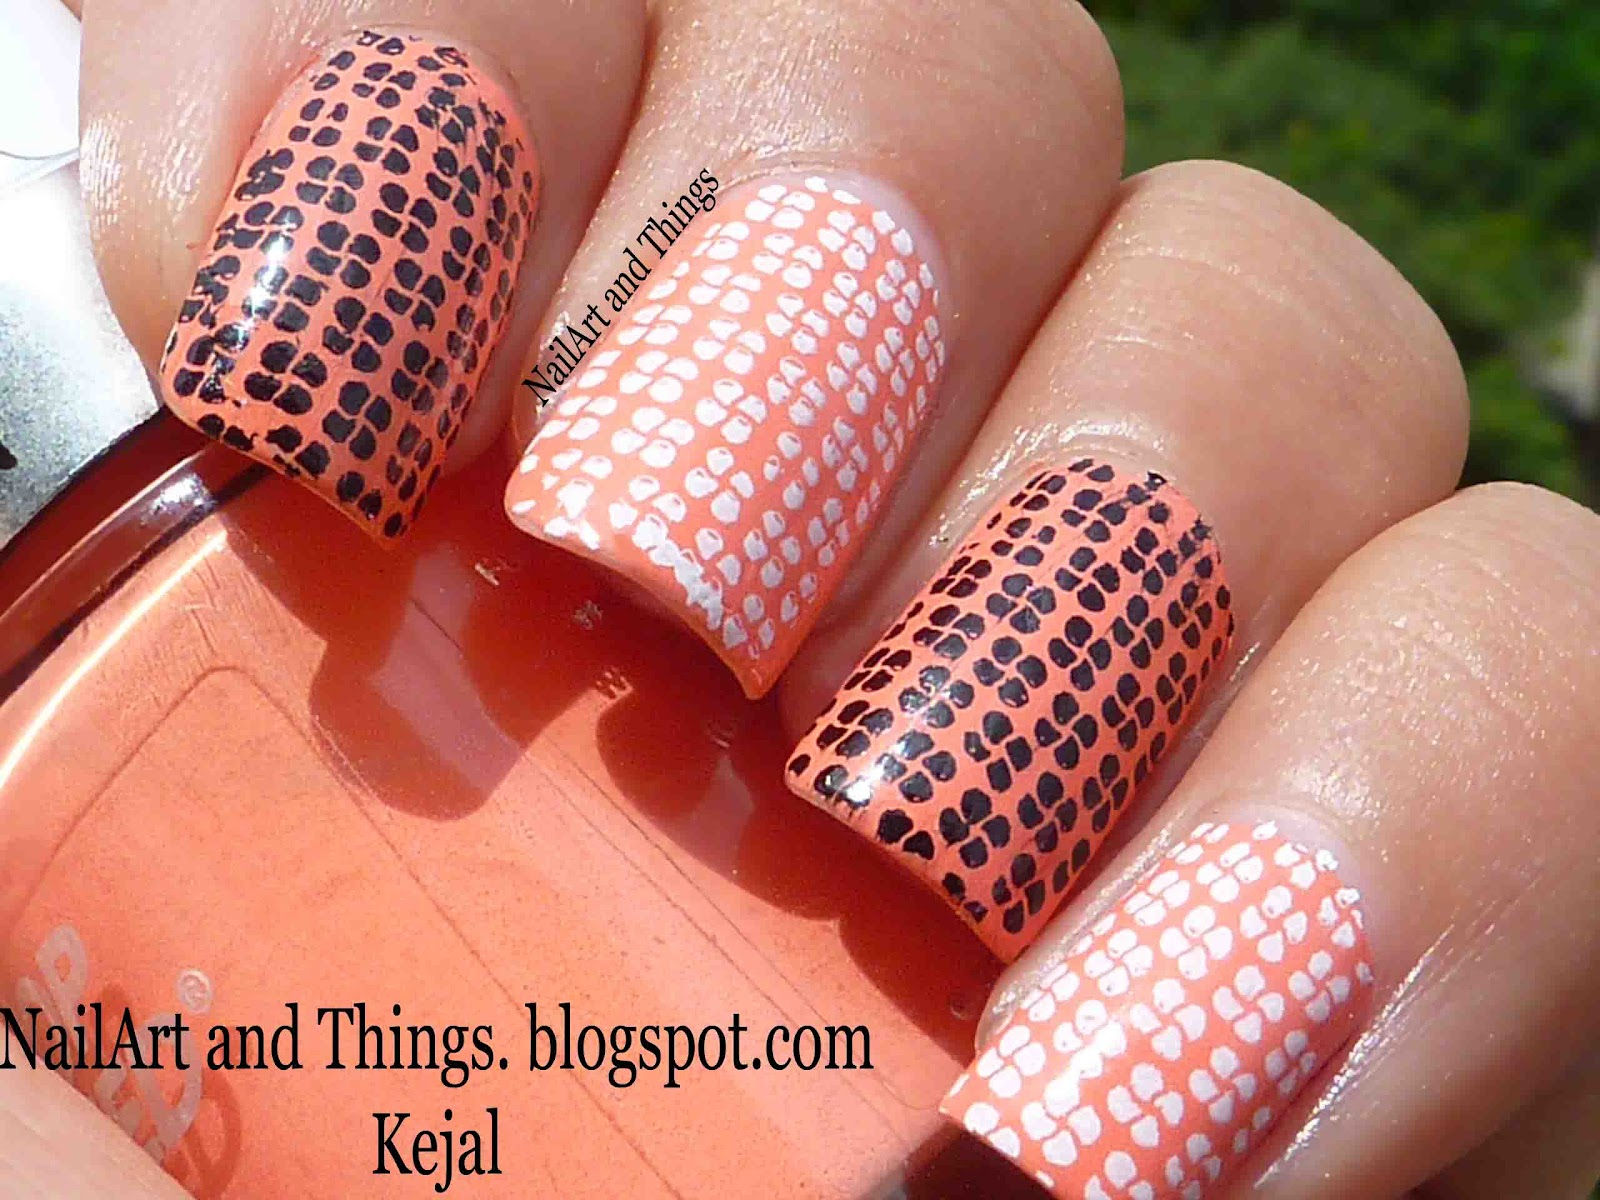 Nailart 101 fantastic nails design fantastic nails design prinsesfo Gallery